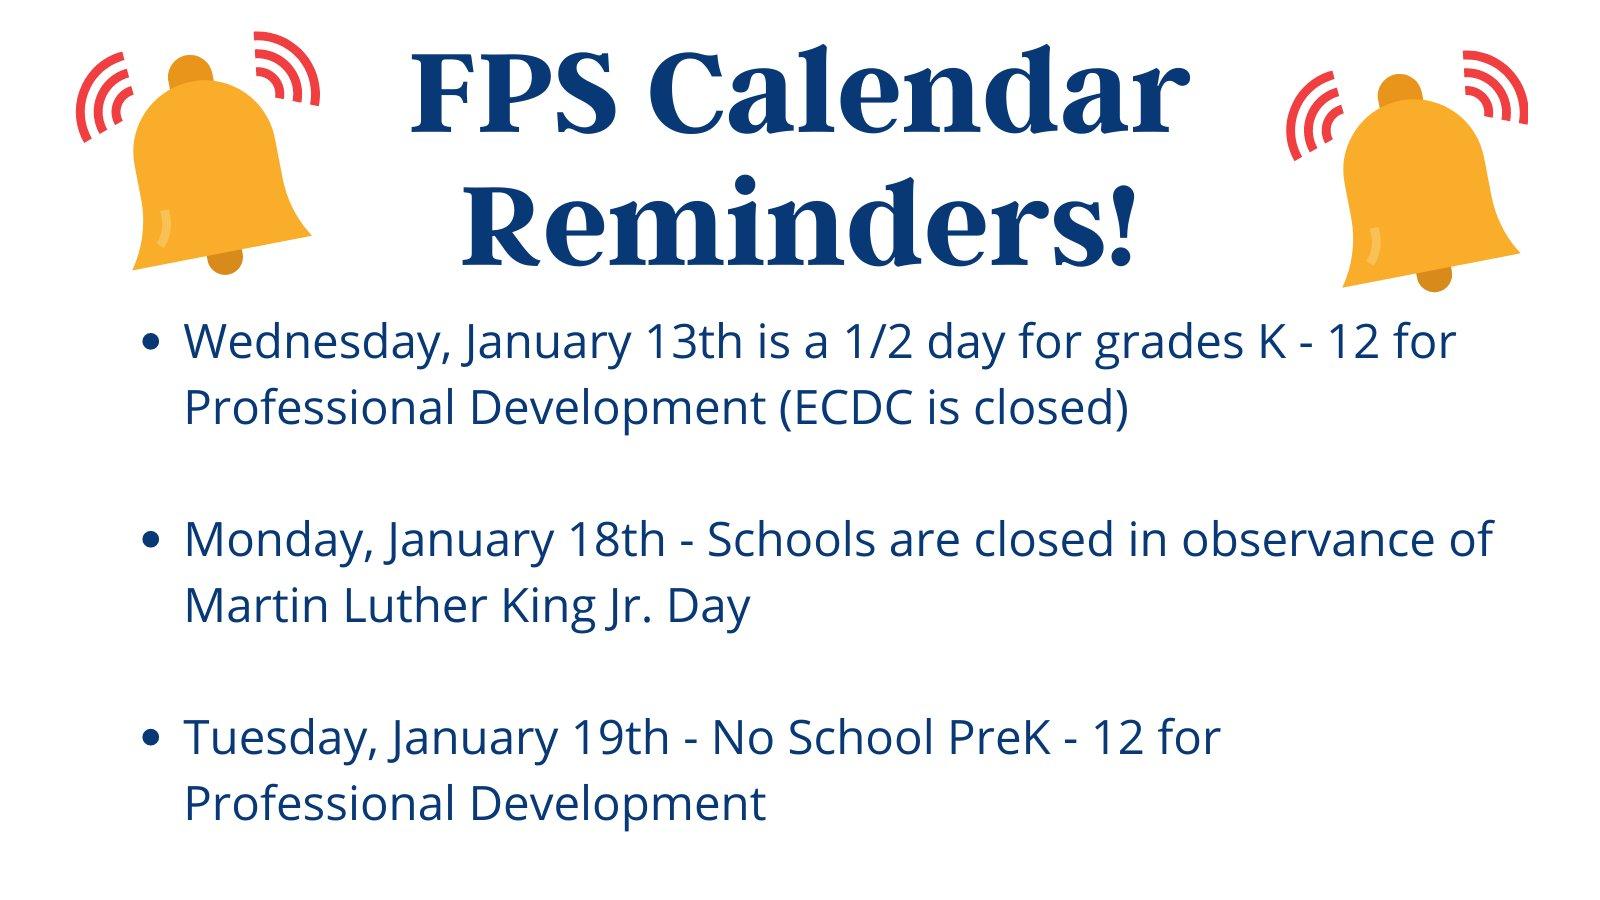 Franklin Public Schools, MA: School schedule reminders